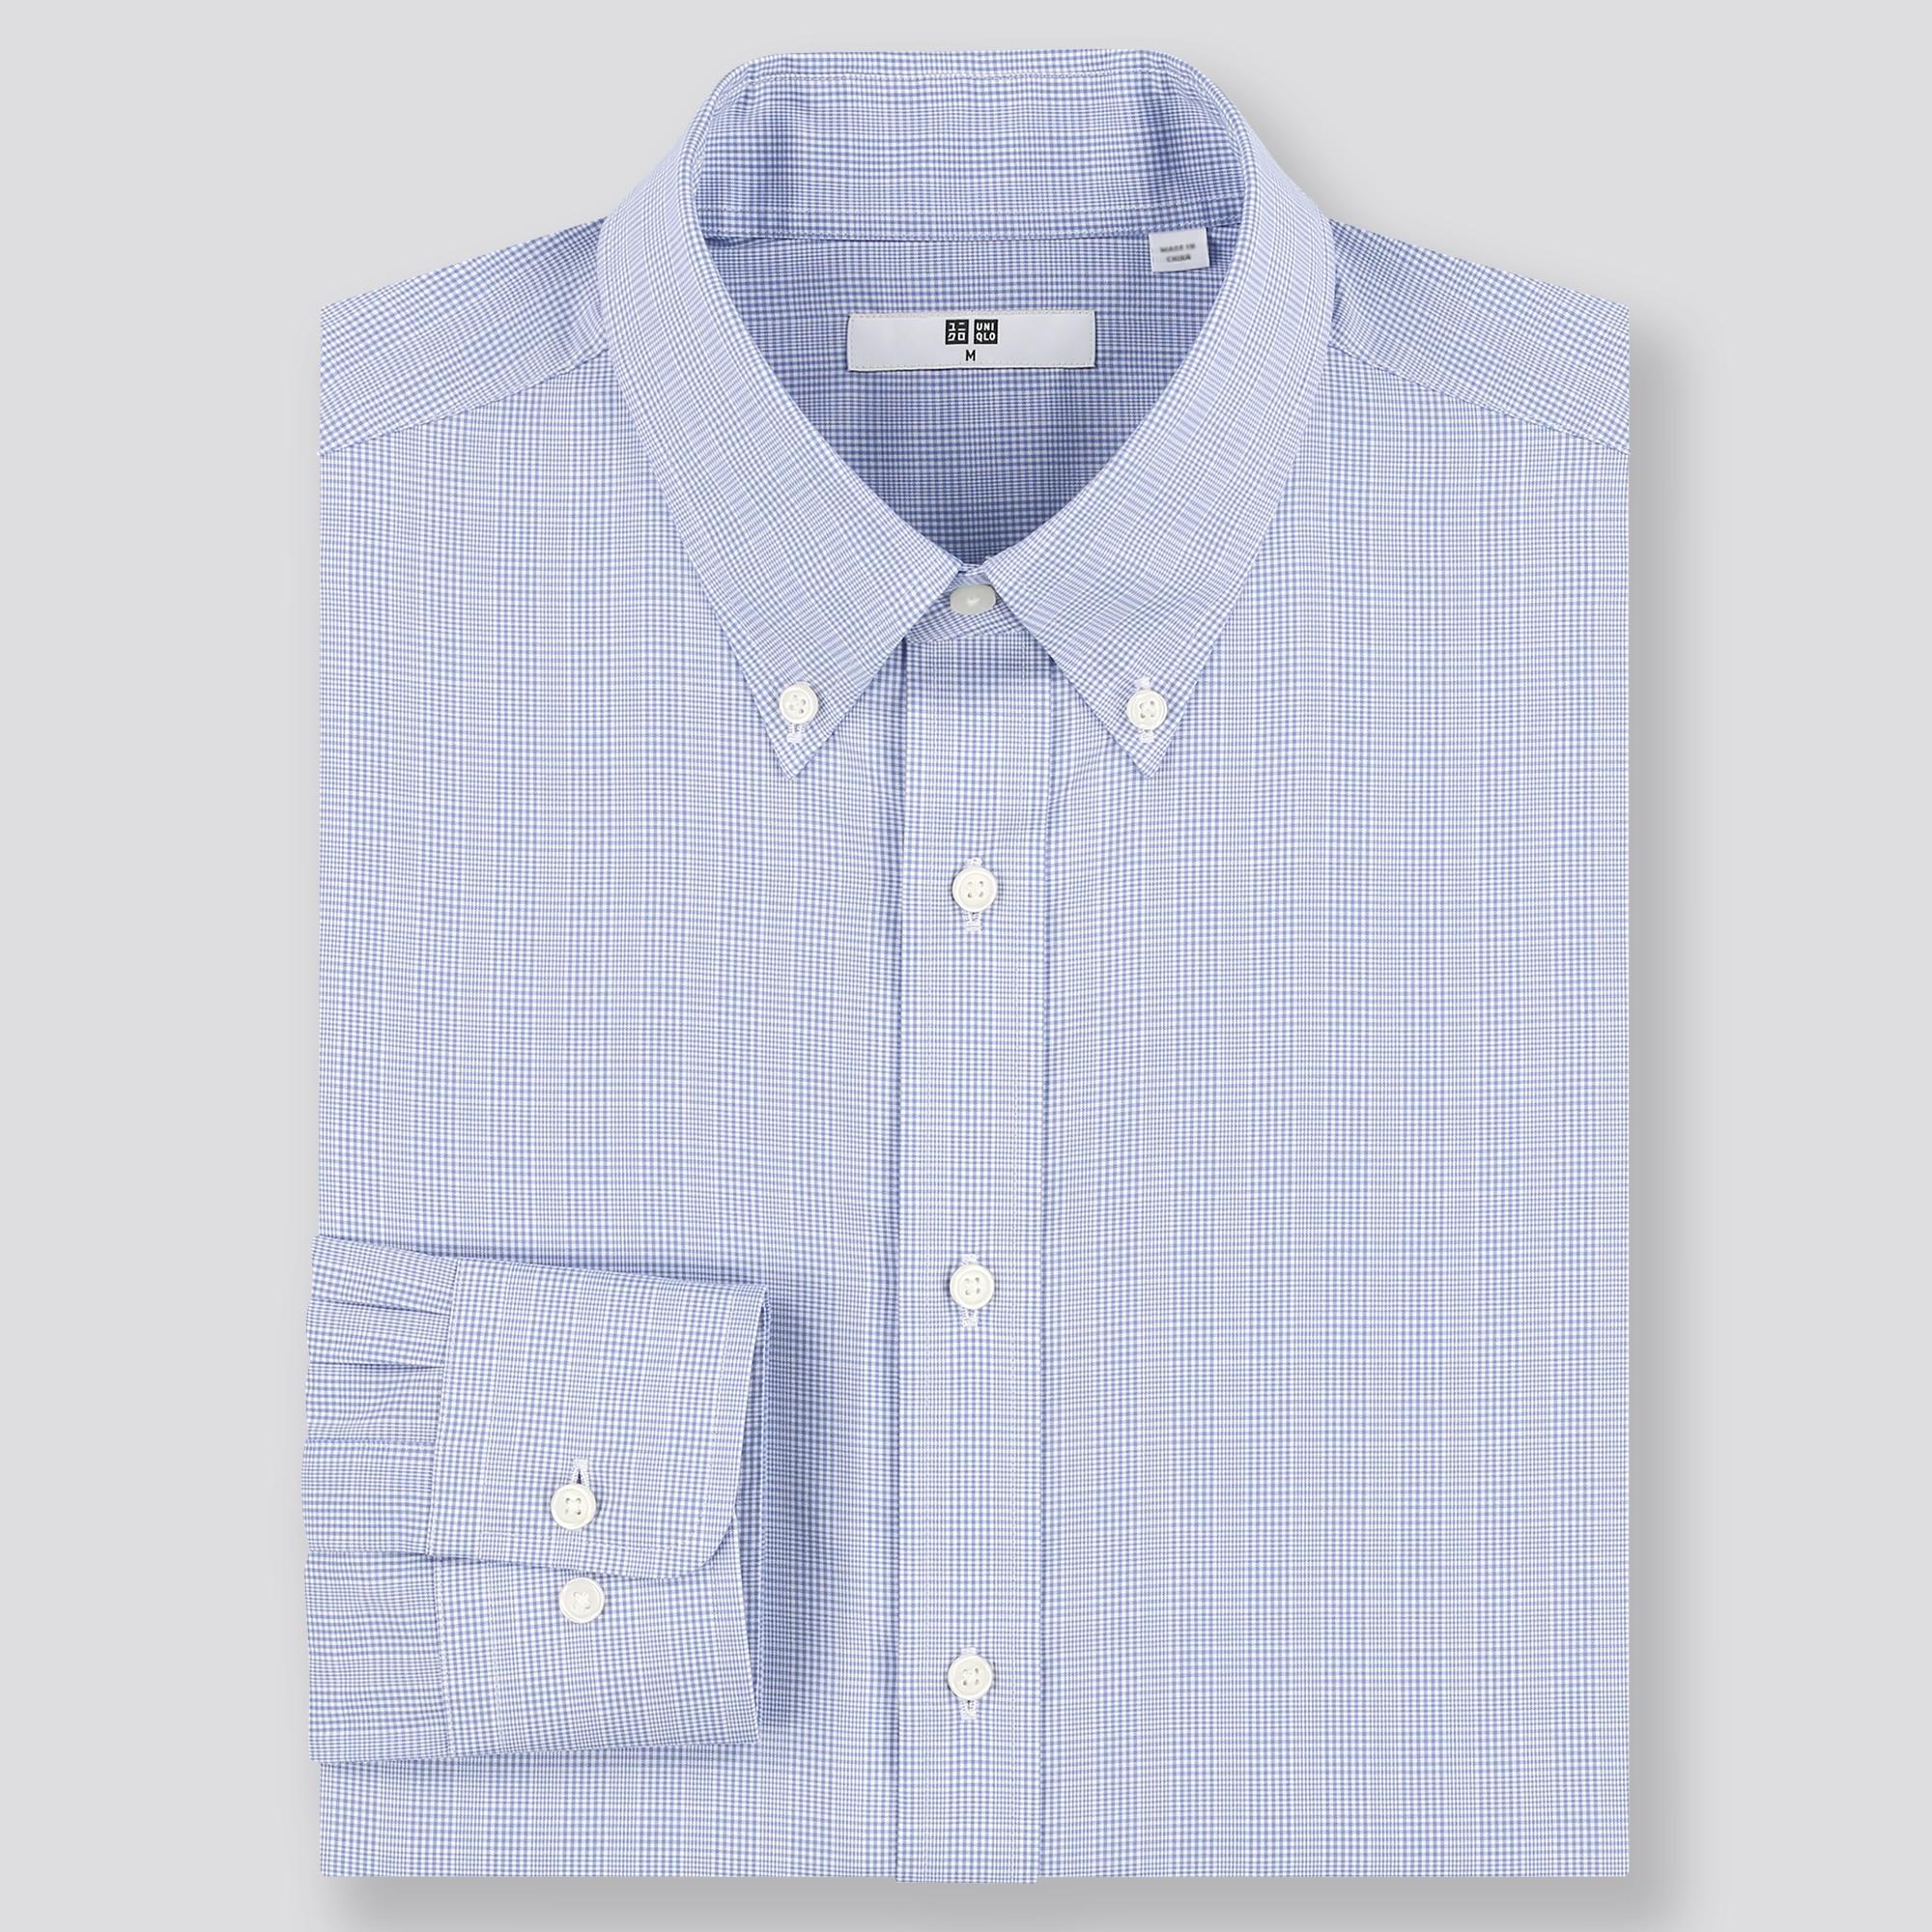 New Mens Regular Fit Long Sleeve One Pocket Oxford Dress Shirt Light Gray